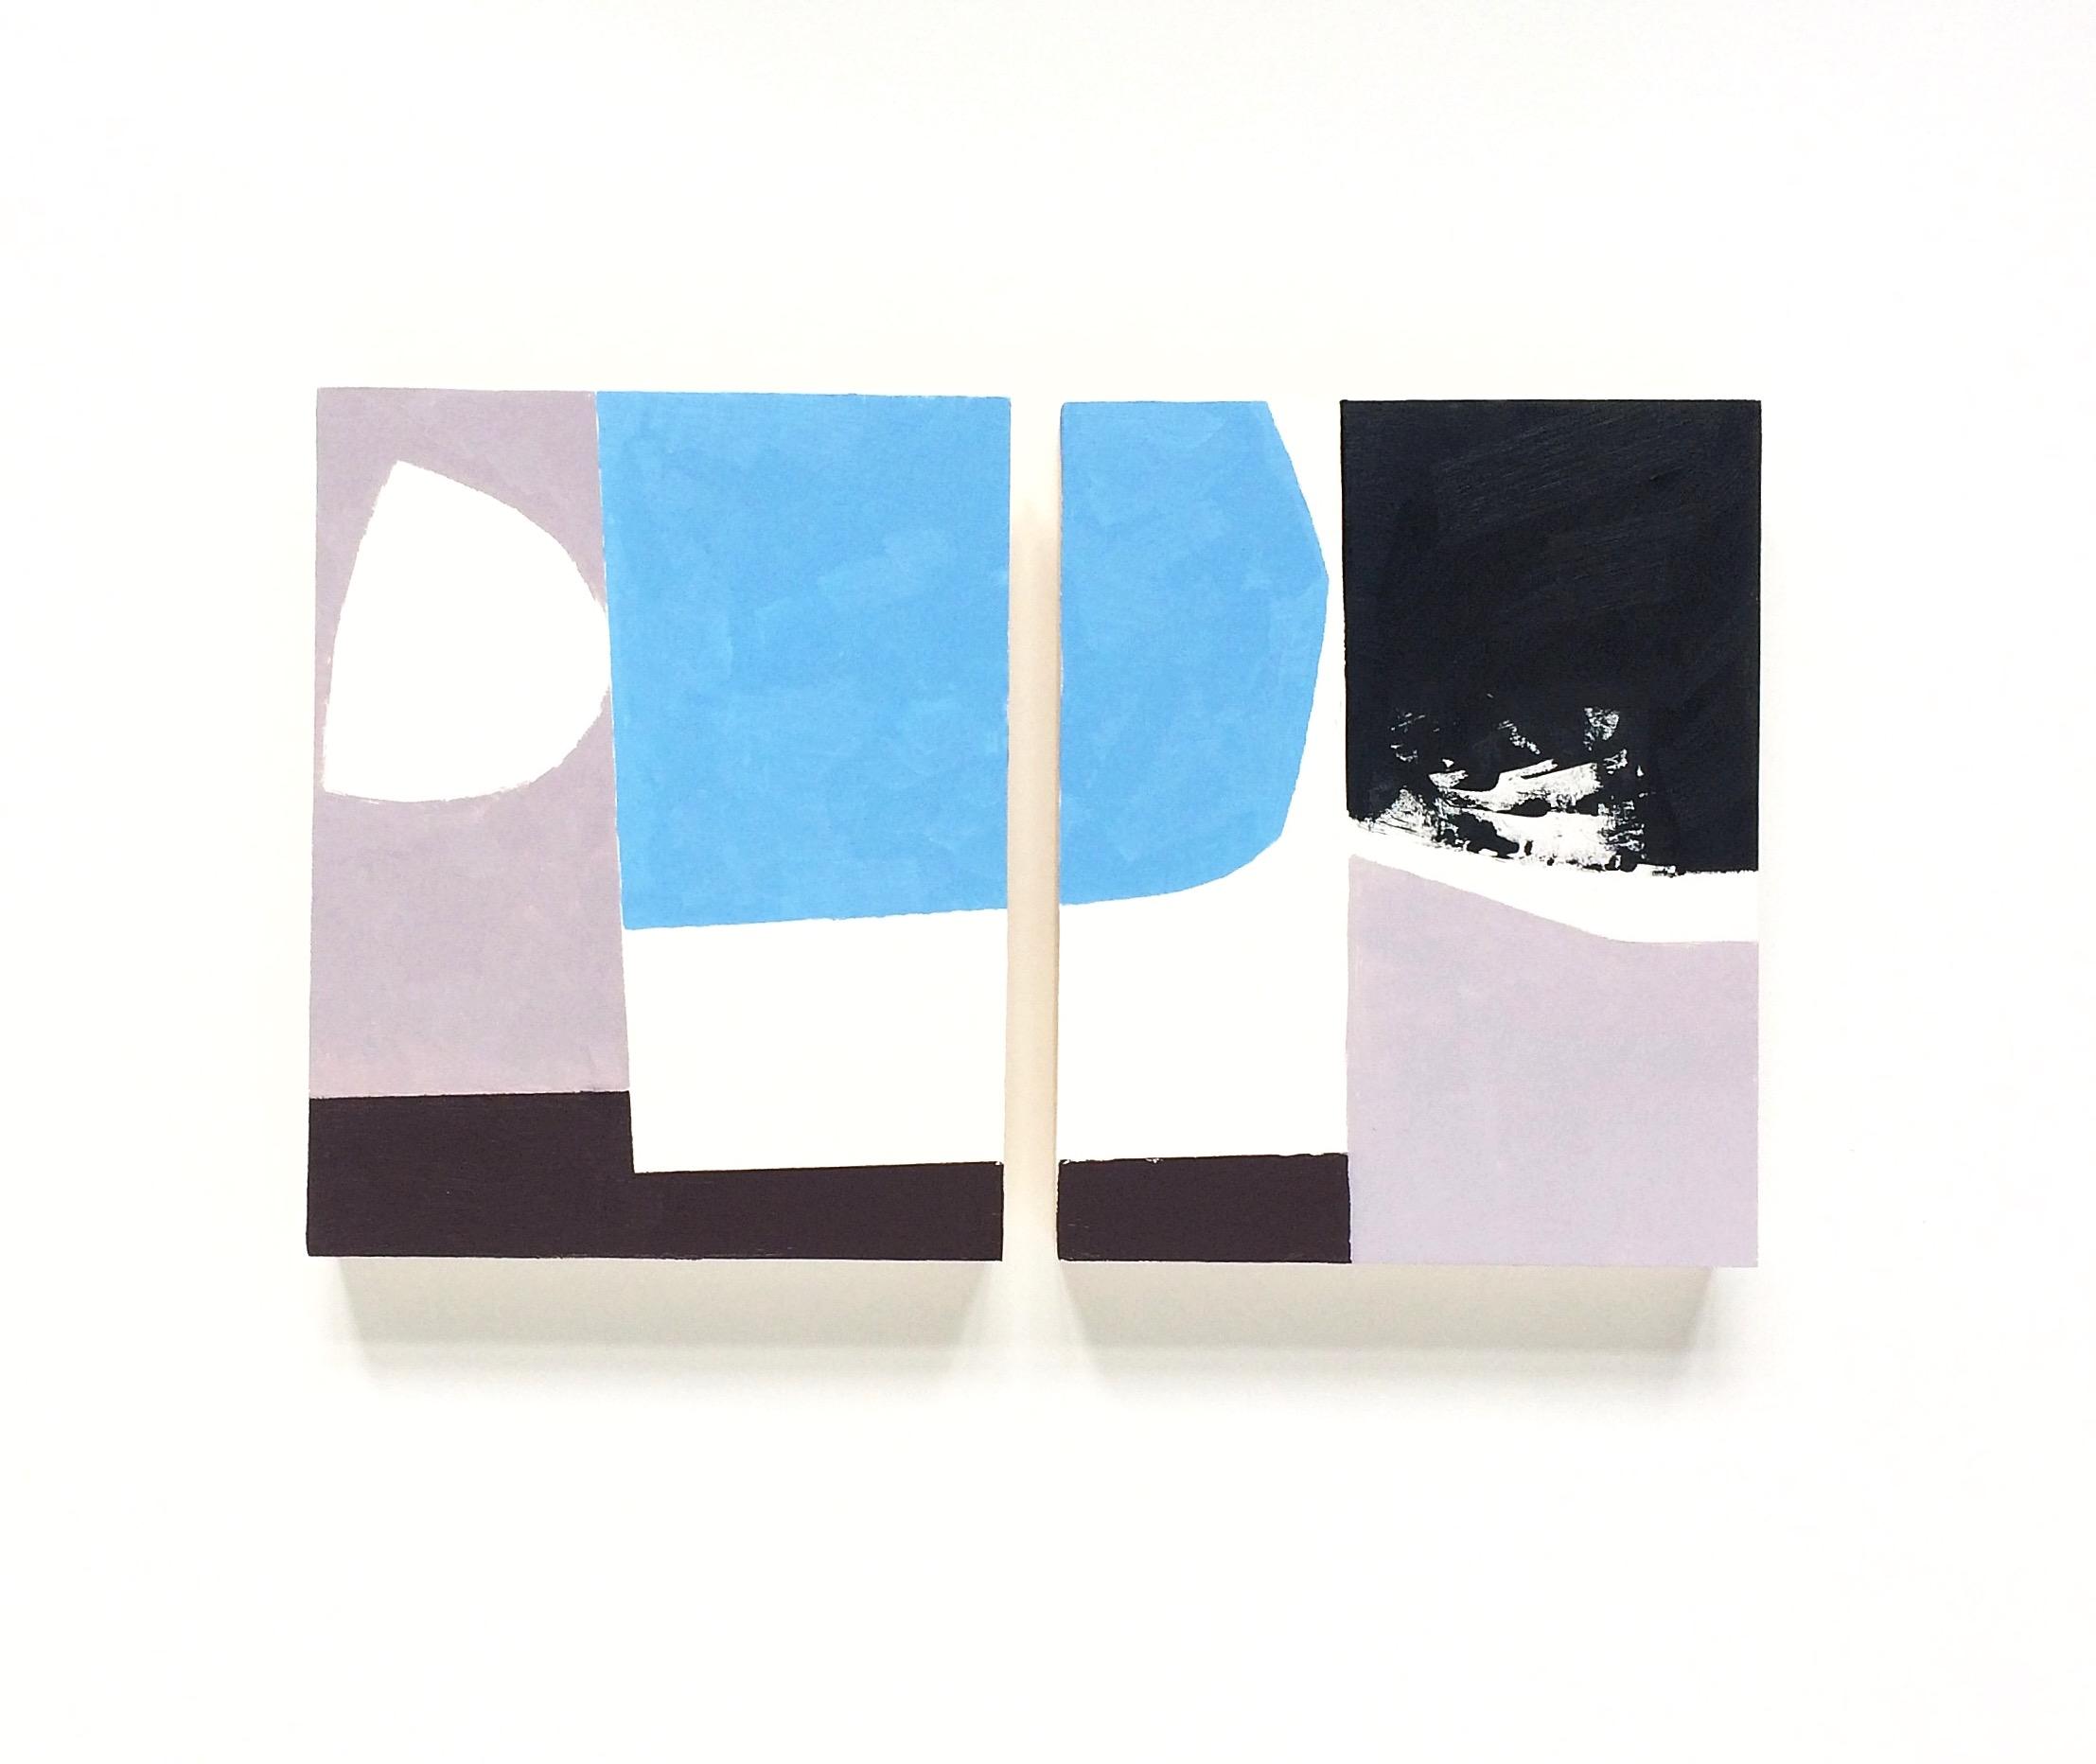 Artwork - Landline oil on panel Painting | Stephen Robson | Buy Today! - oil on panel